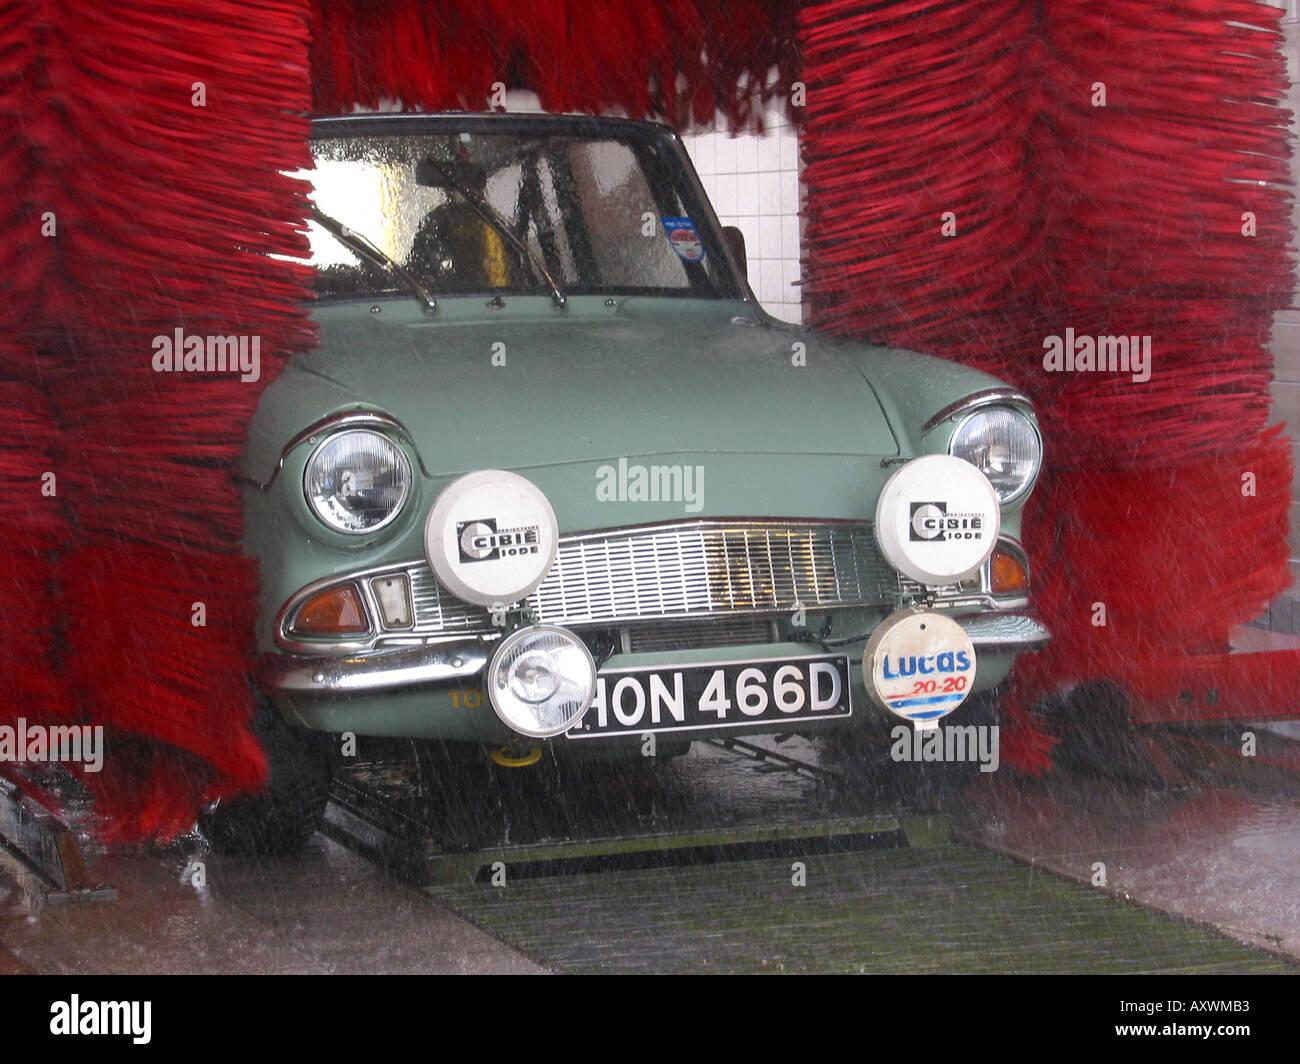 Mint car wash